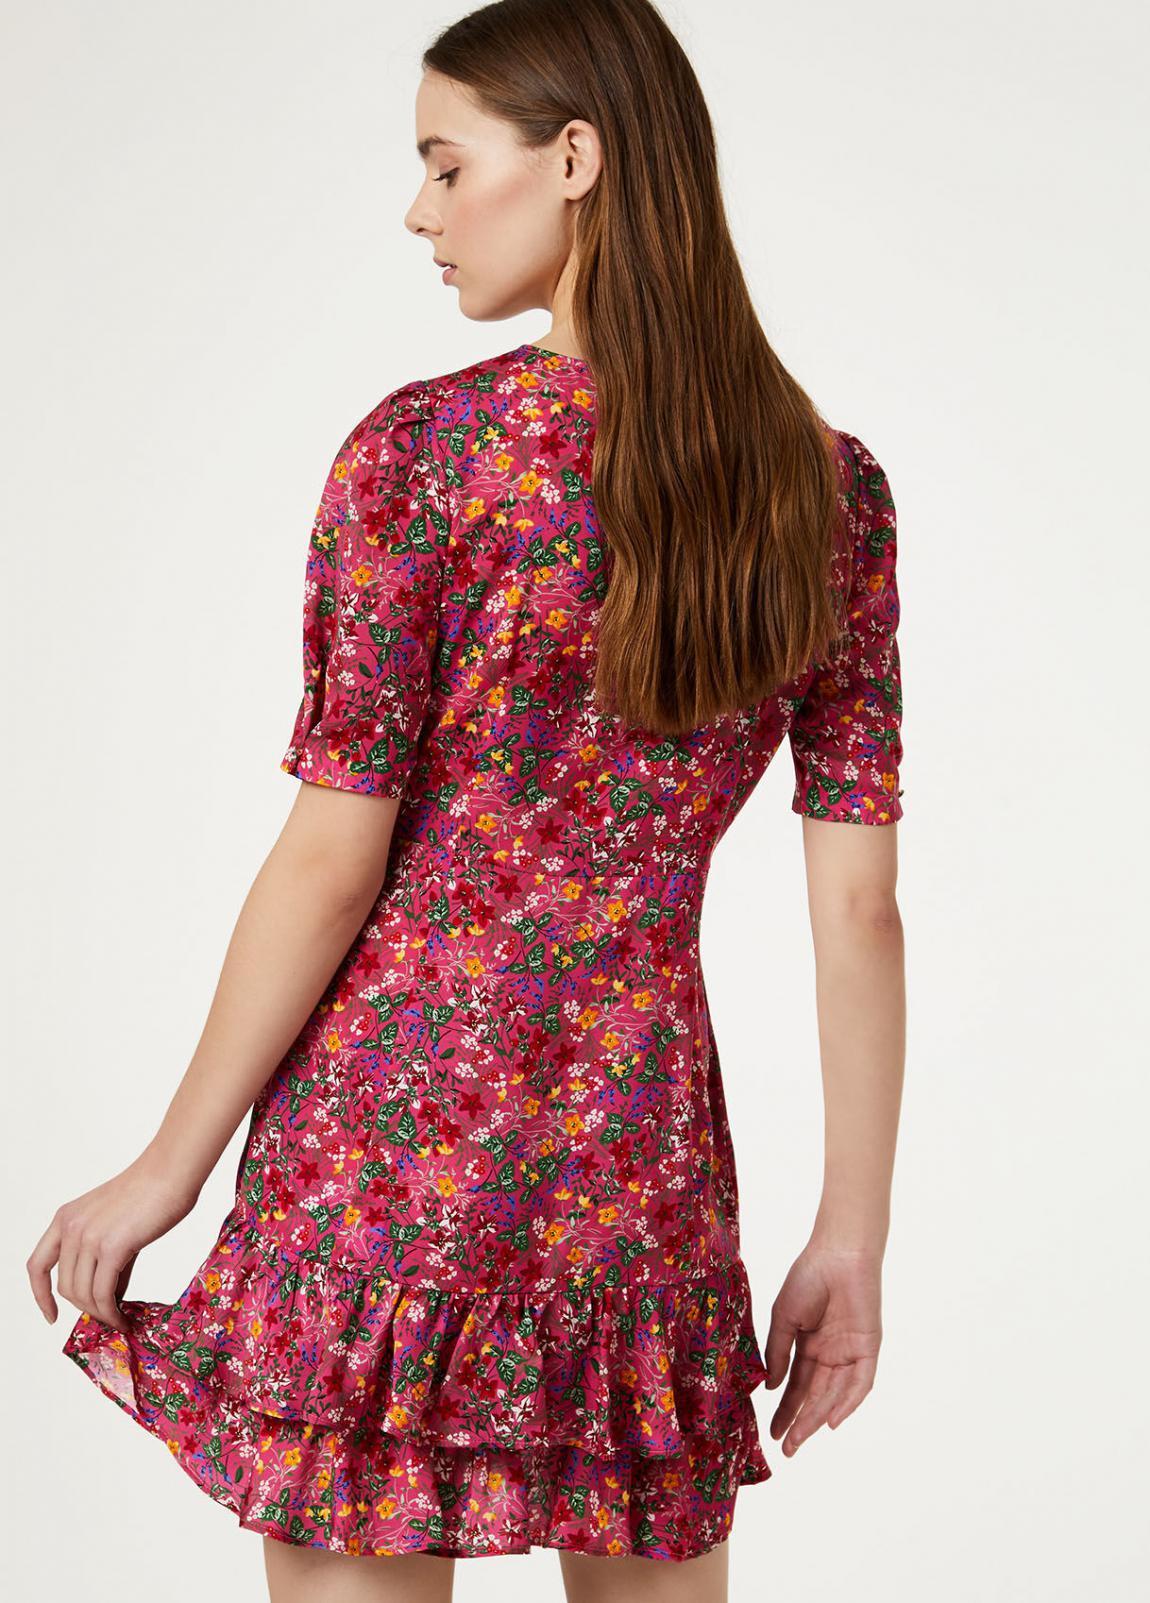 Damen Kurzes Kleid Mit Volant  Liu Jo Kleider — Pax Domini